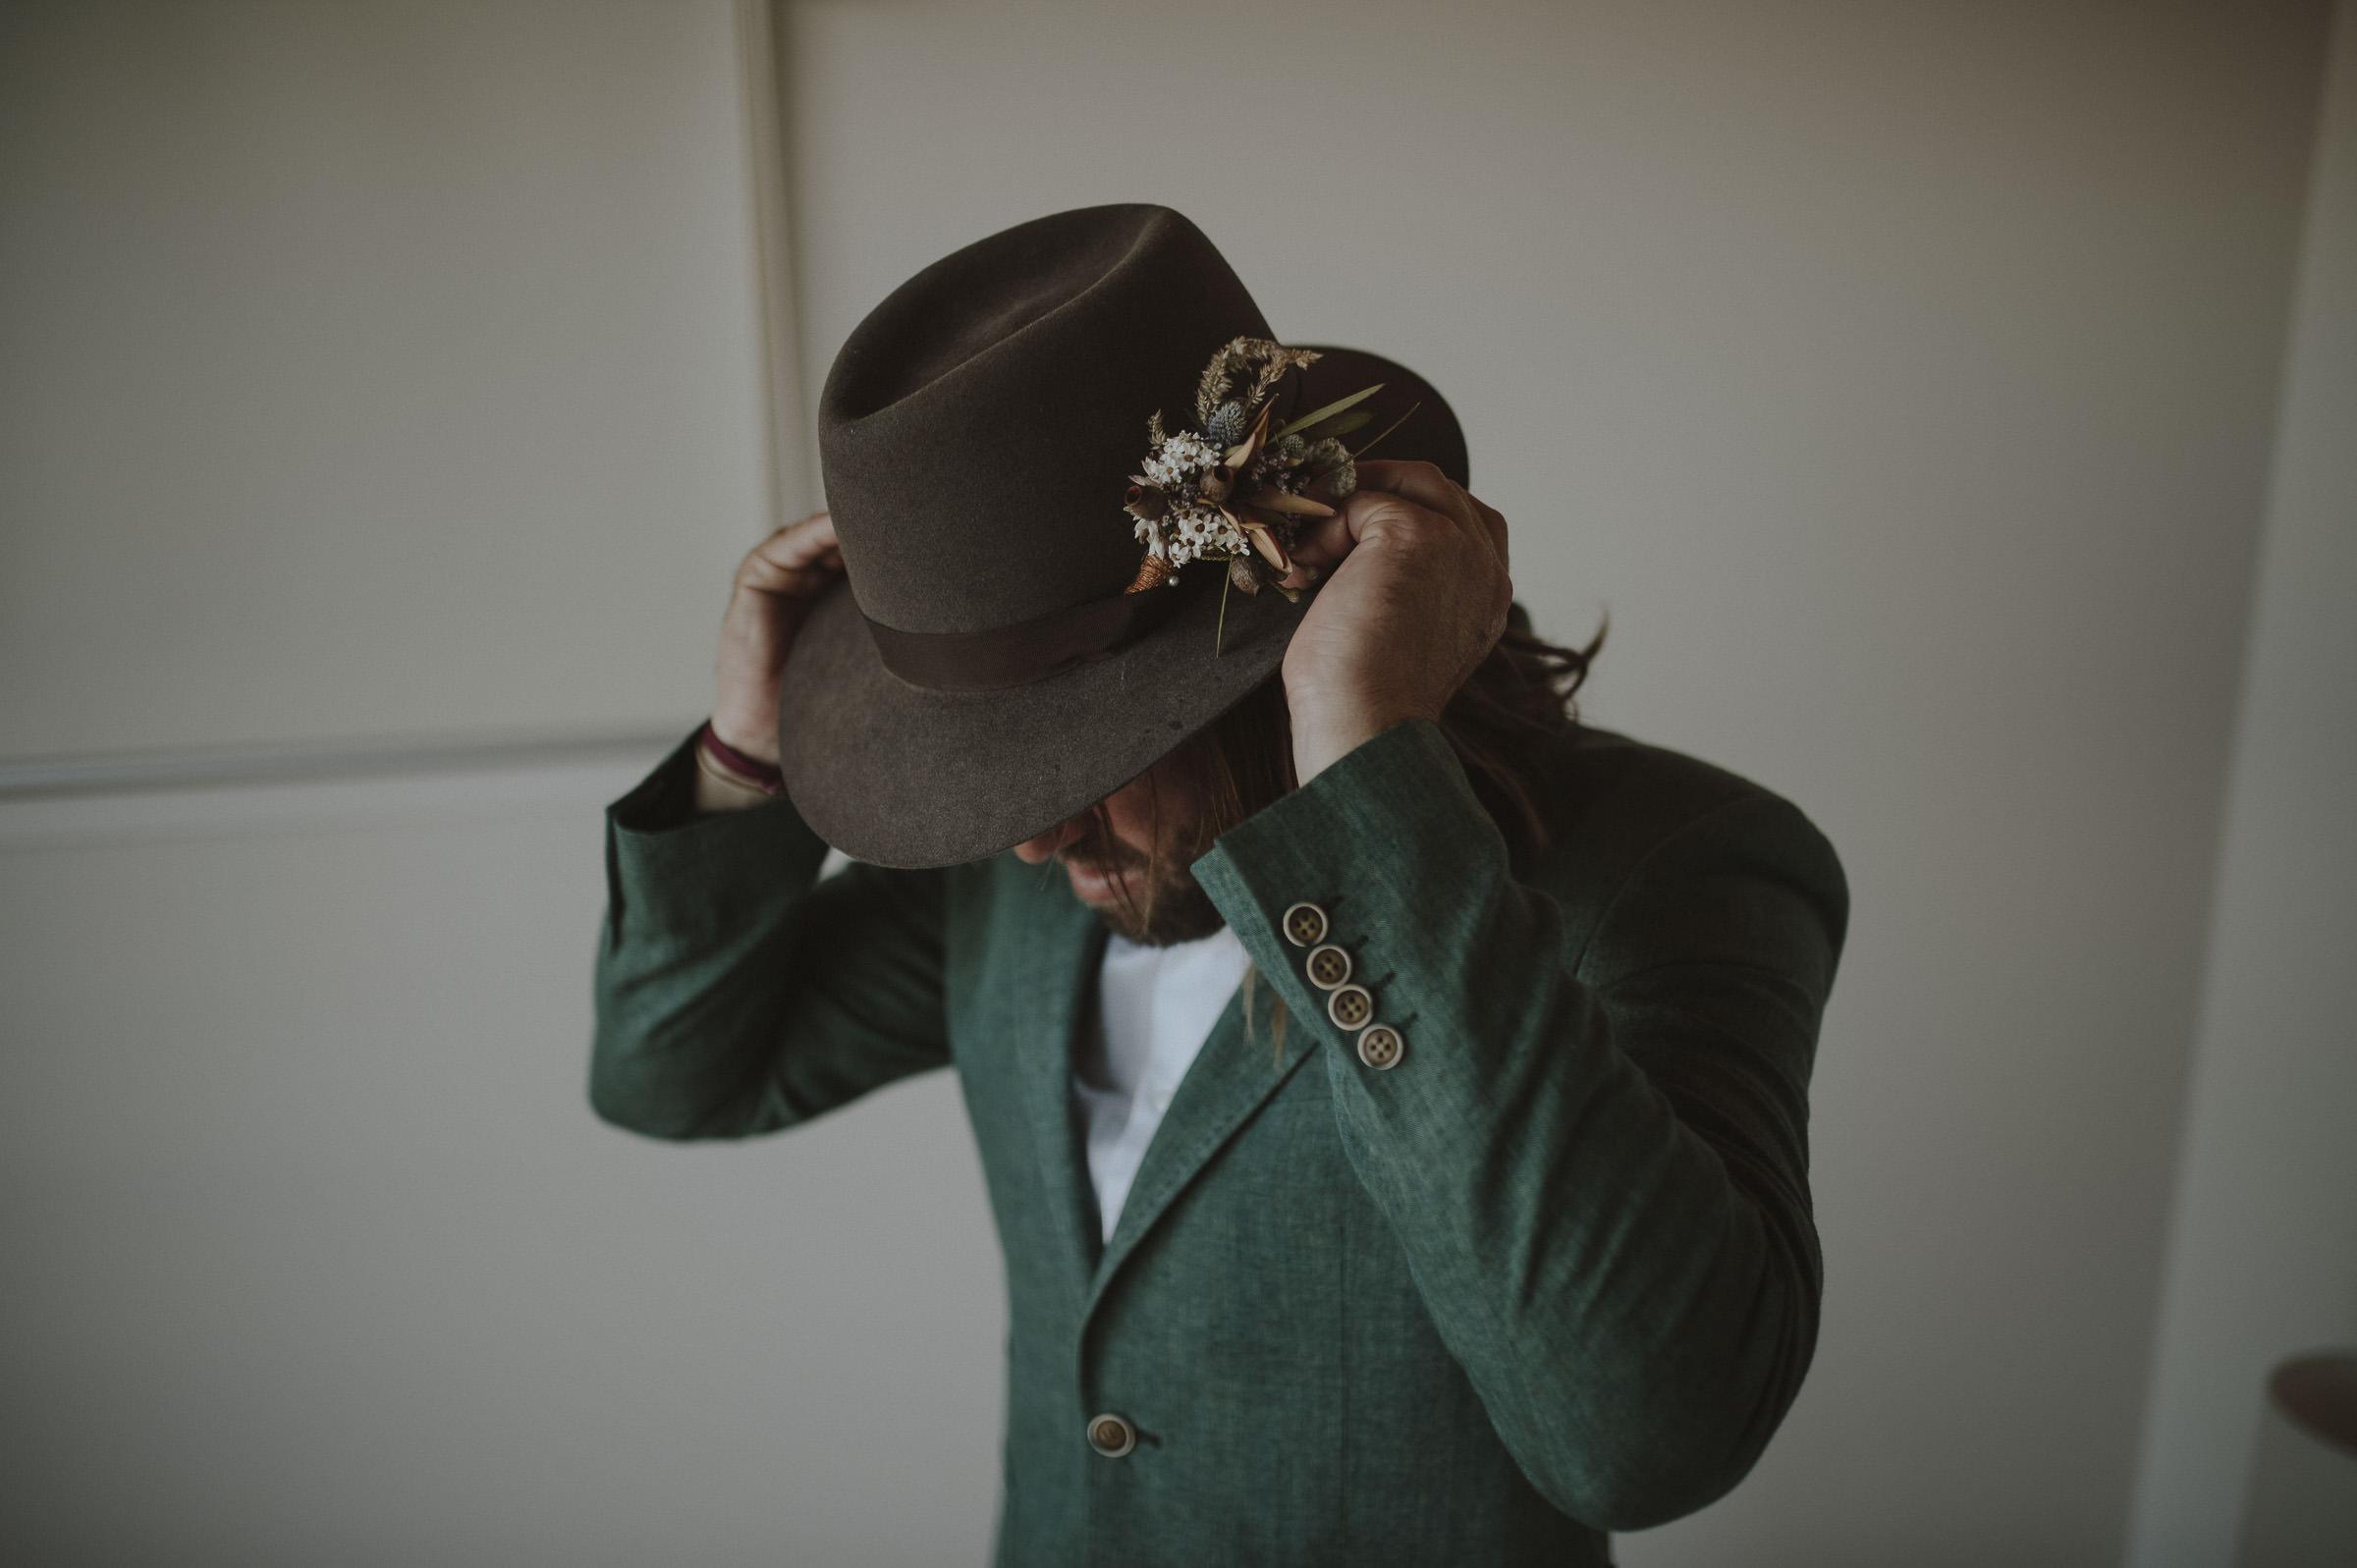 Jack_Millie_Seal_Rocks_Wedding_Photographer_Blog-18.jpg